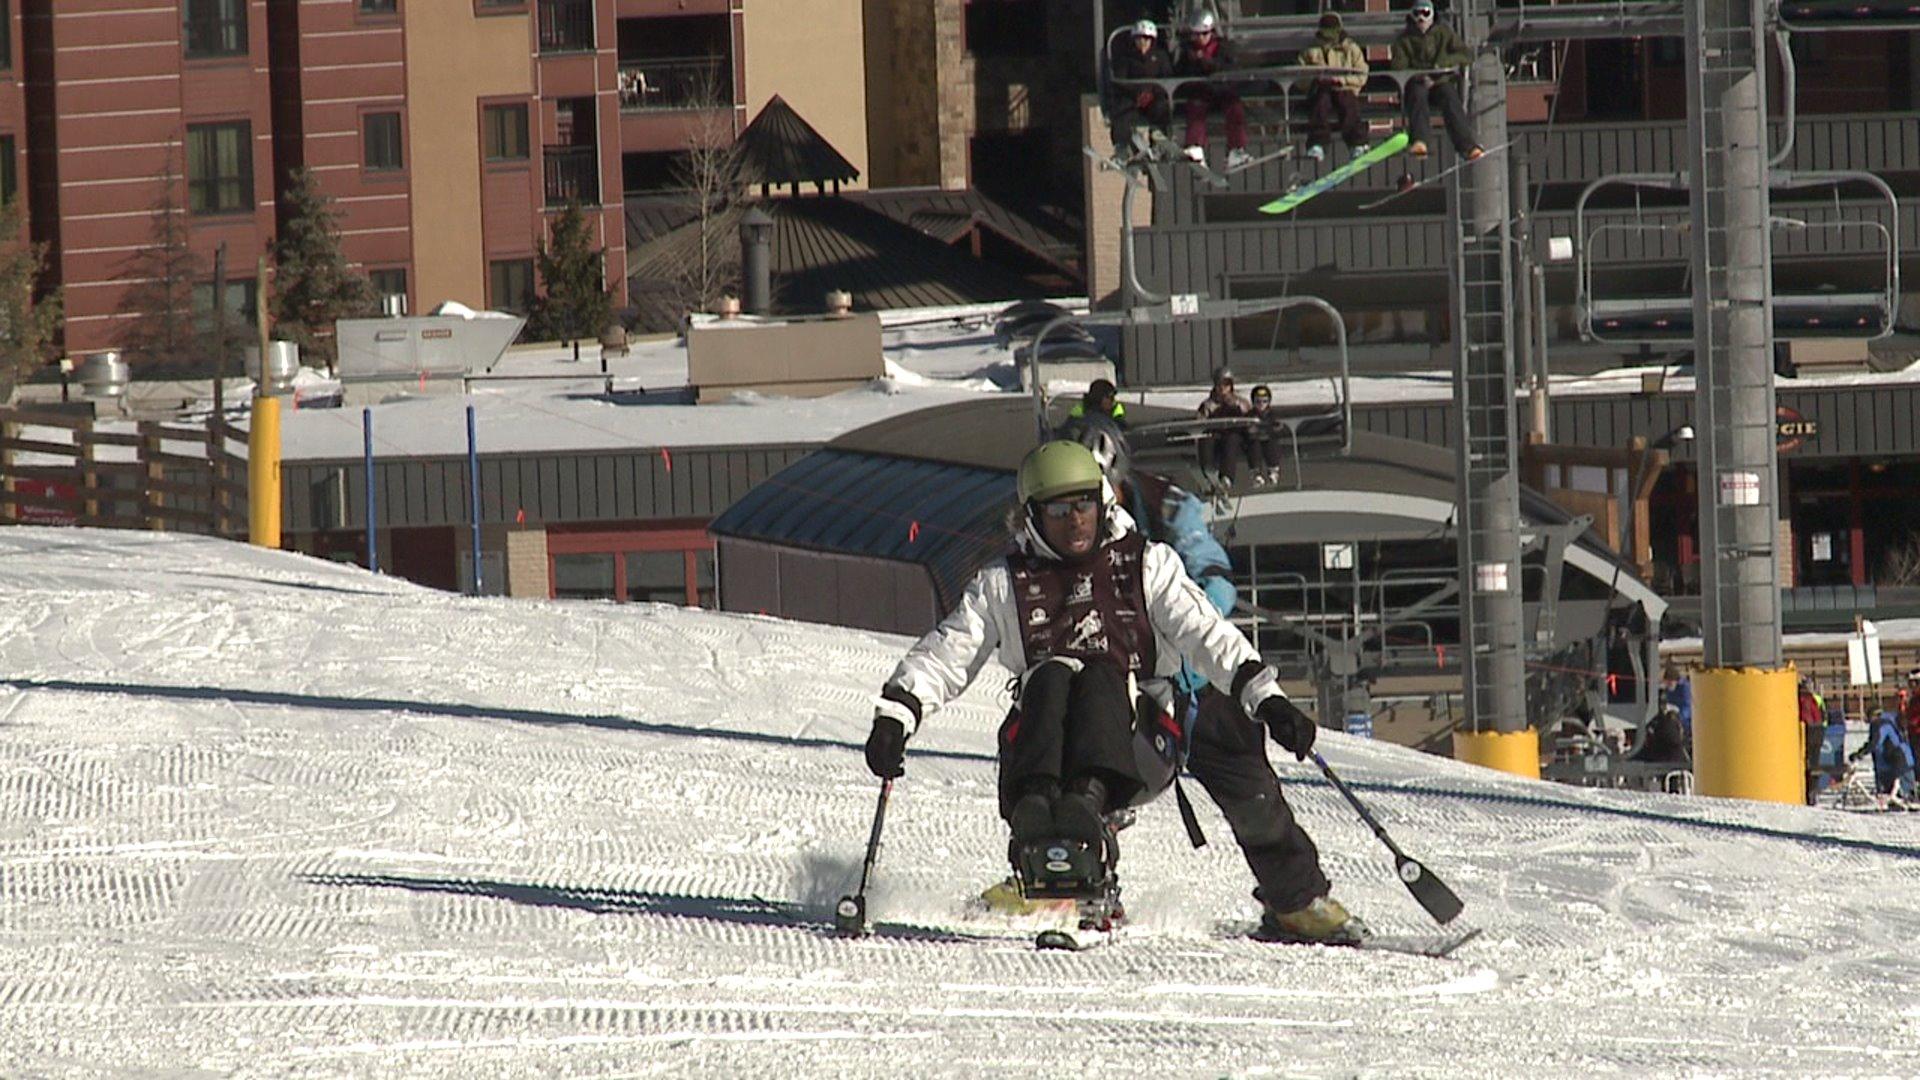 Disabled veterans skiing at Breckenridge